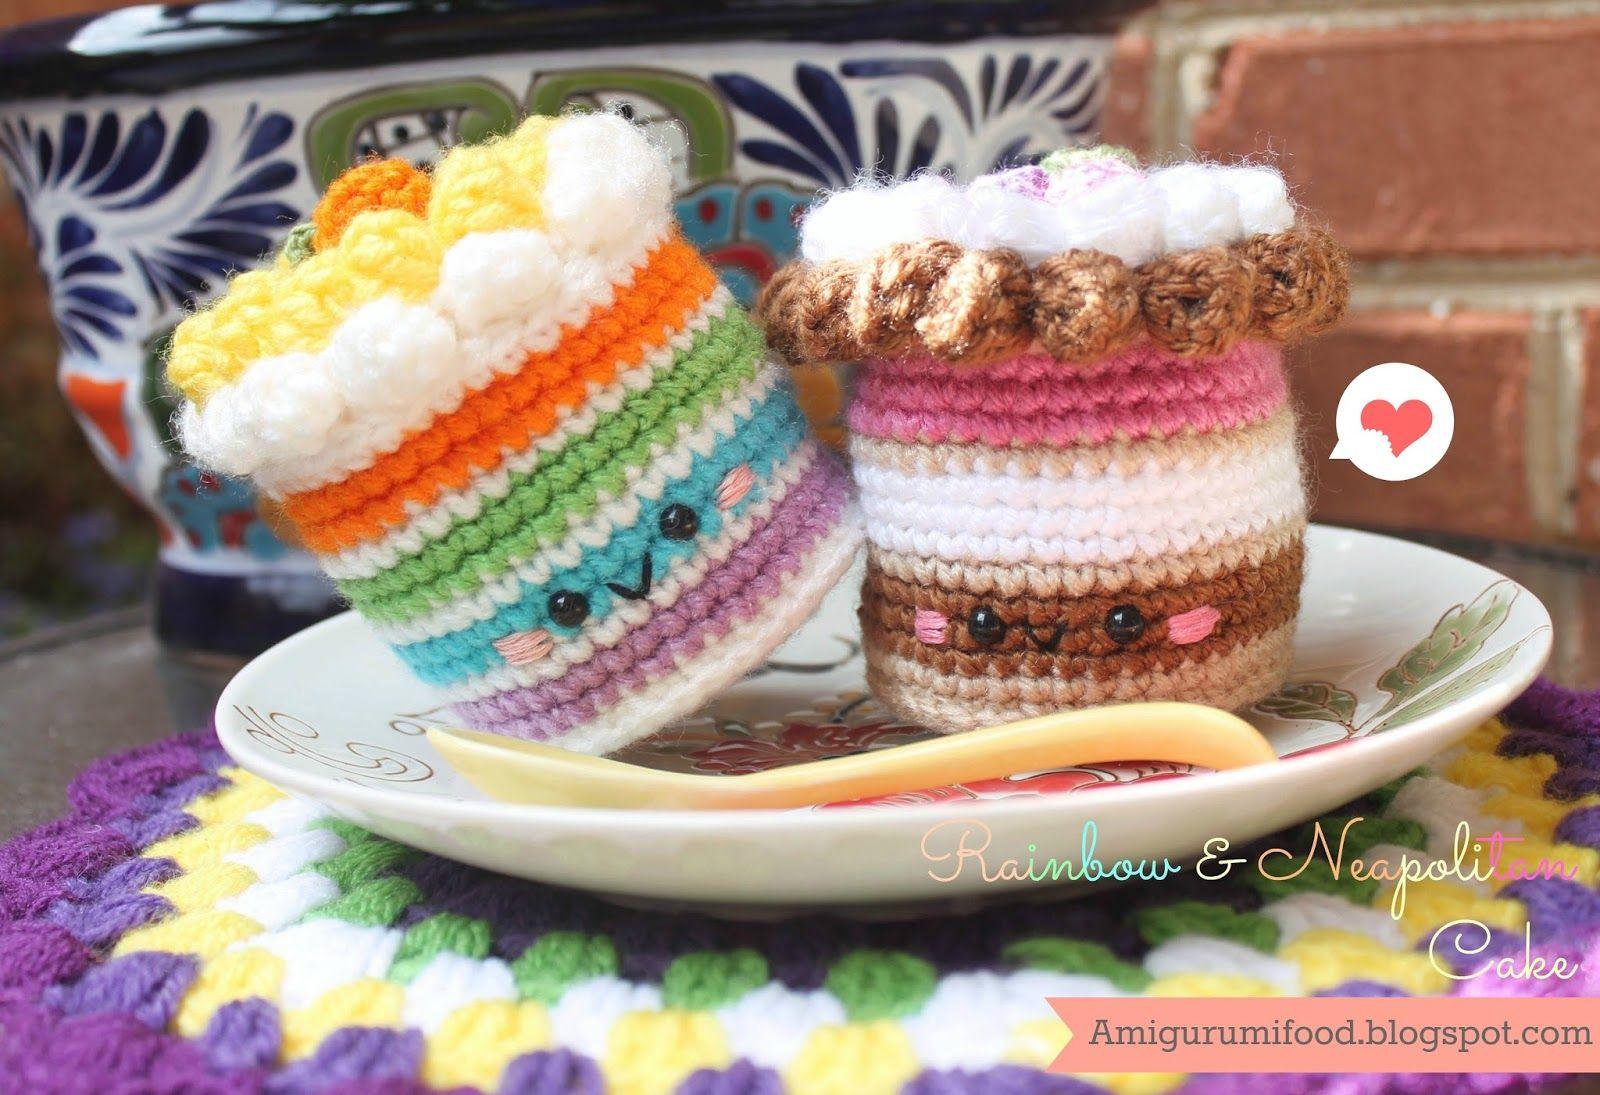 Rainbow cake and neapolitan cake free pattern crochet food rainbow cake and neapolitan cake free pattern crochet food amigurumi food free pattern crochetfood bankloansurffo Choice Image